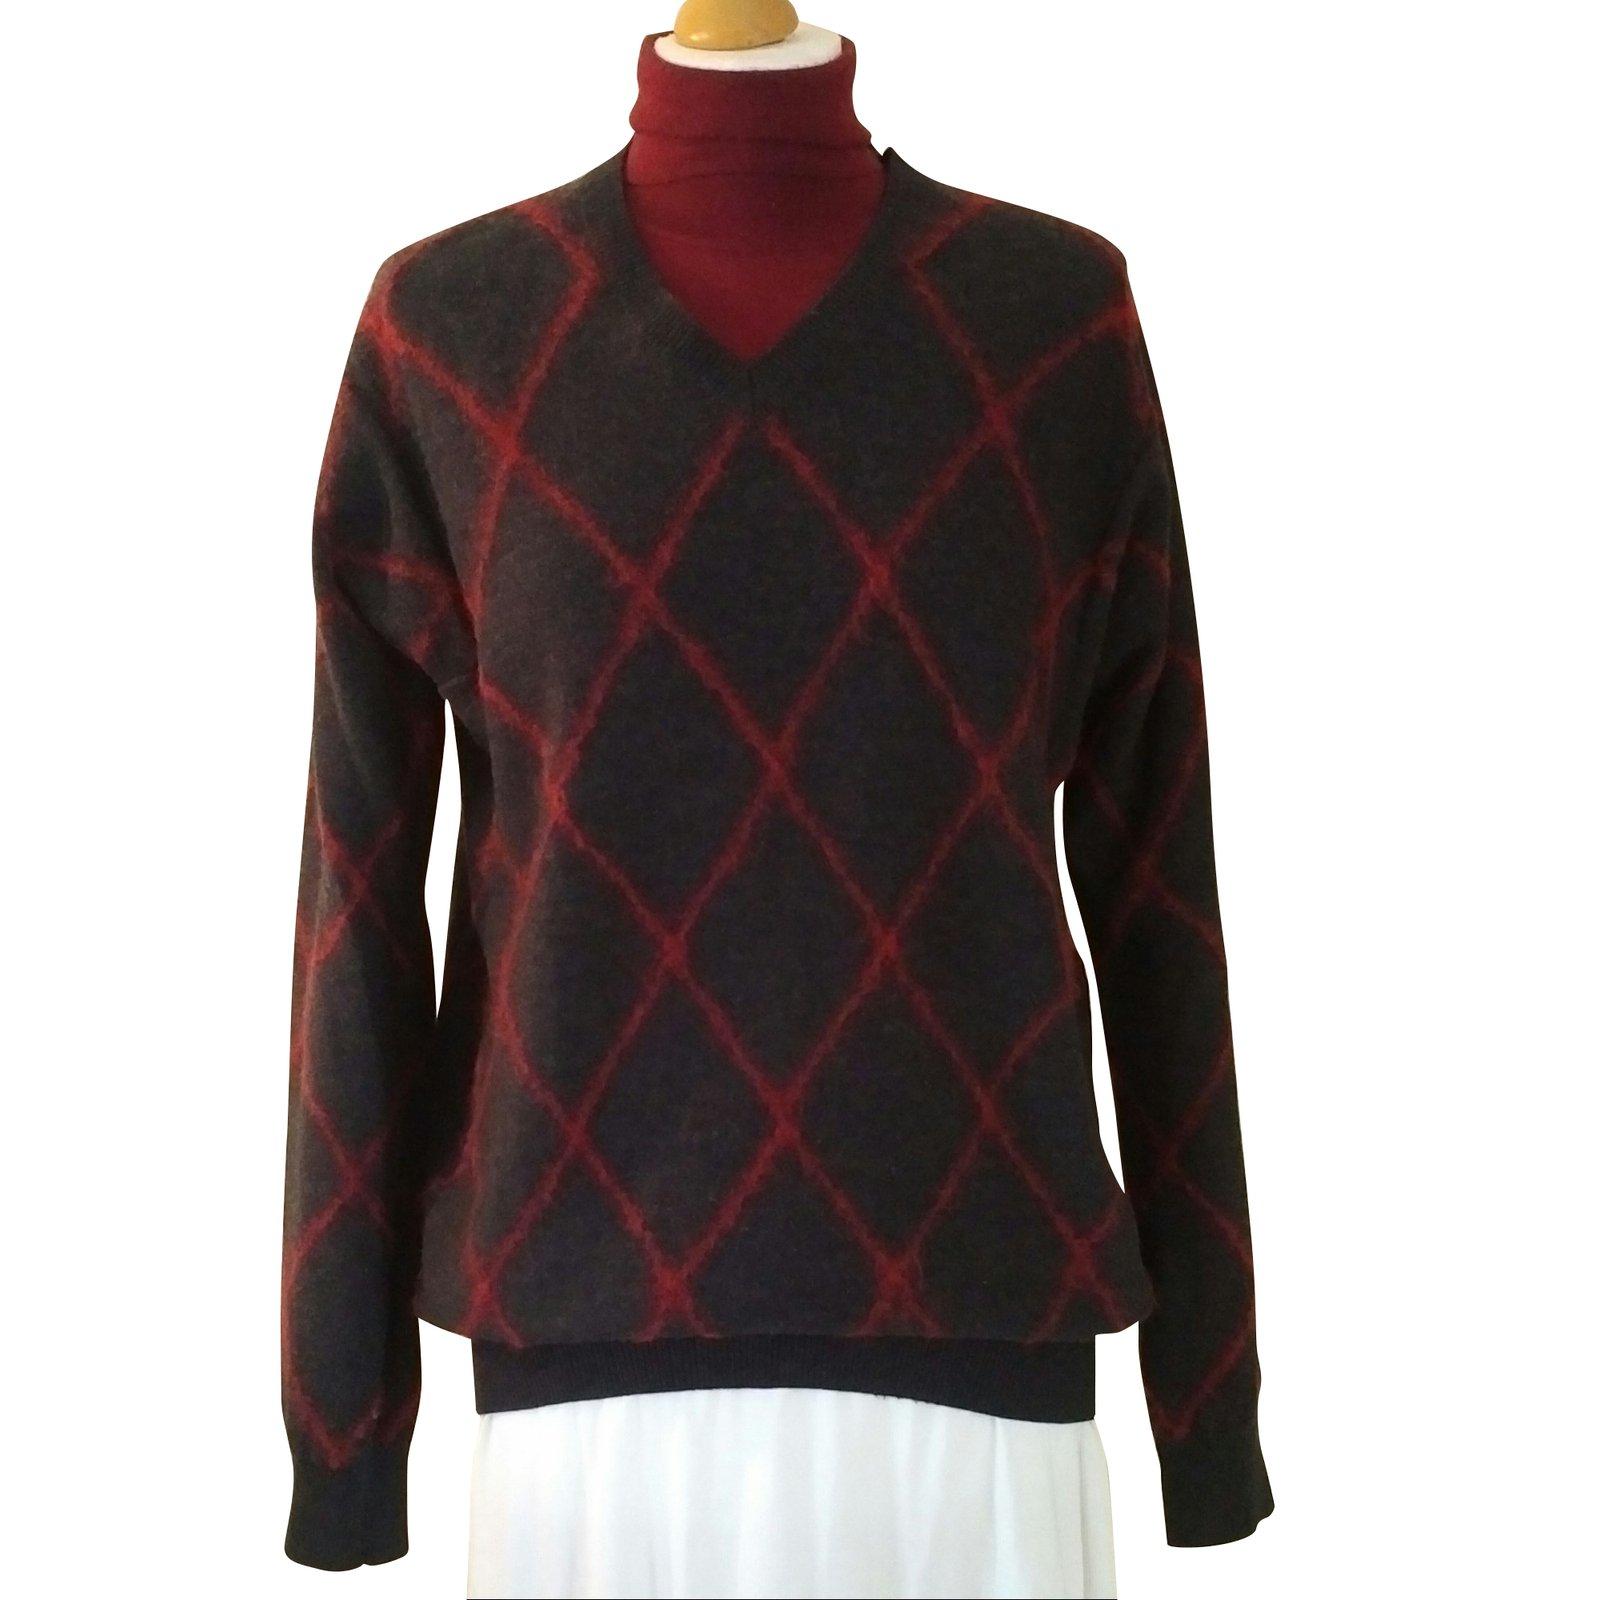 6716cee9fd461a Pringle Of Scotland Dark Grey Pringle Argyle Knitwear Wool Dark grey  ref.105459